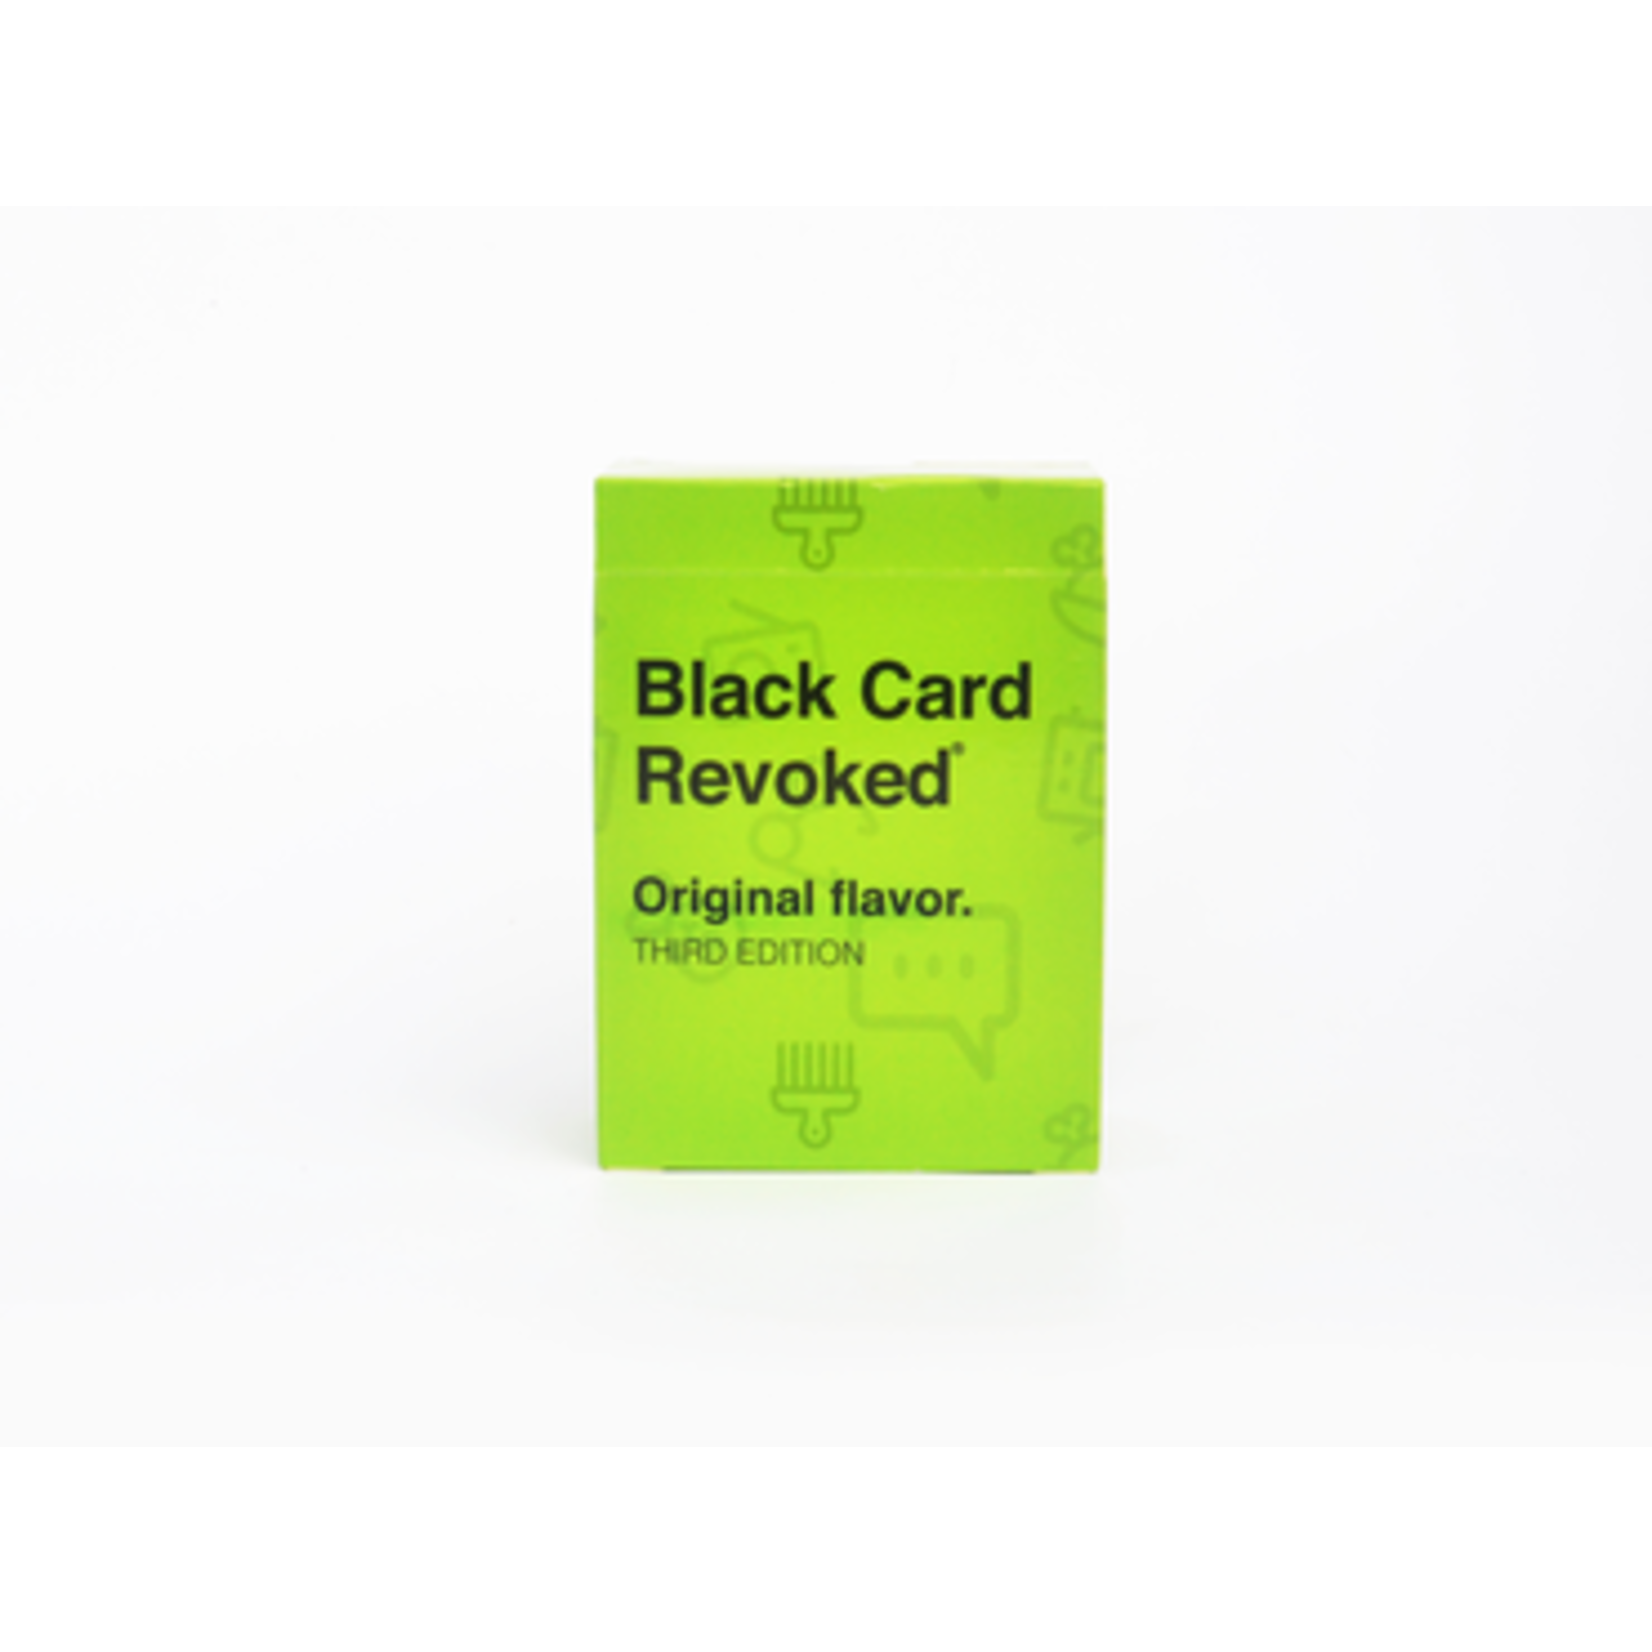 Black Card Revoked - Original Flavor 3